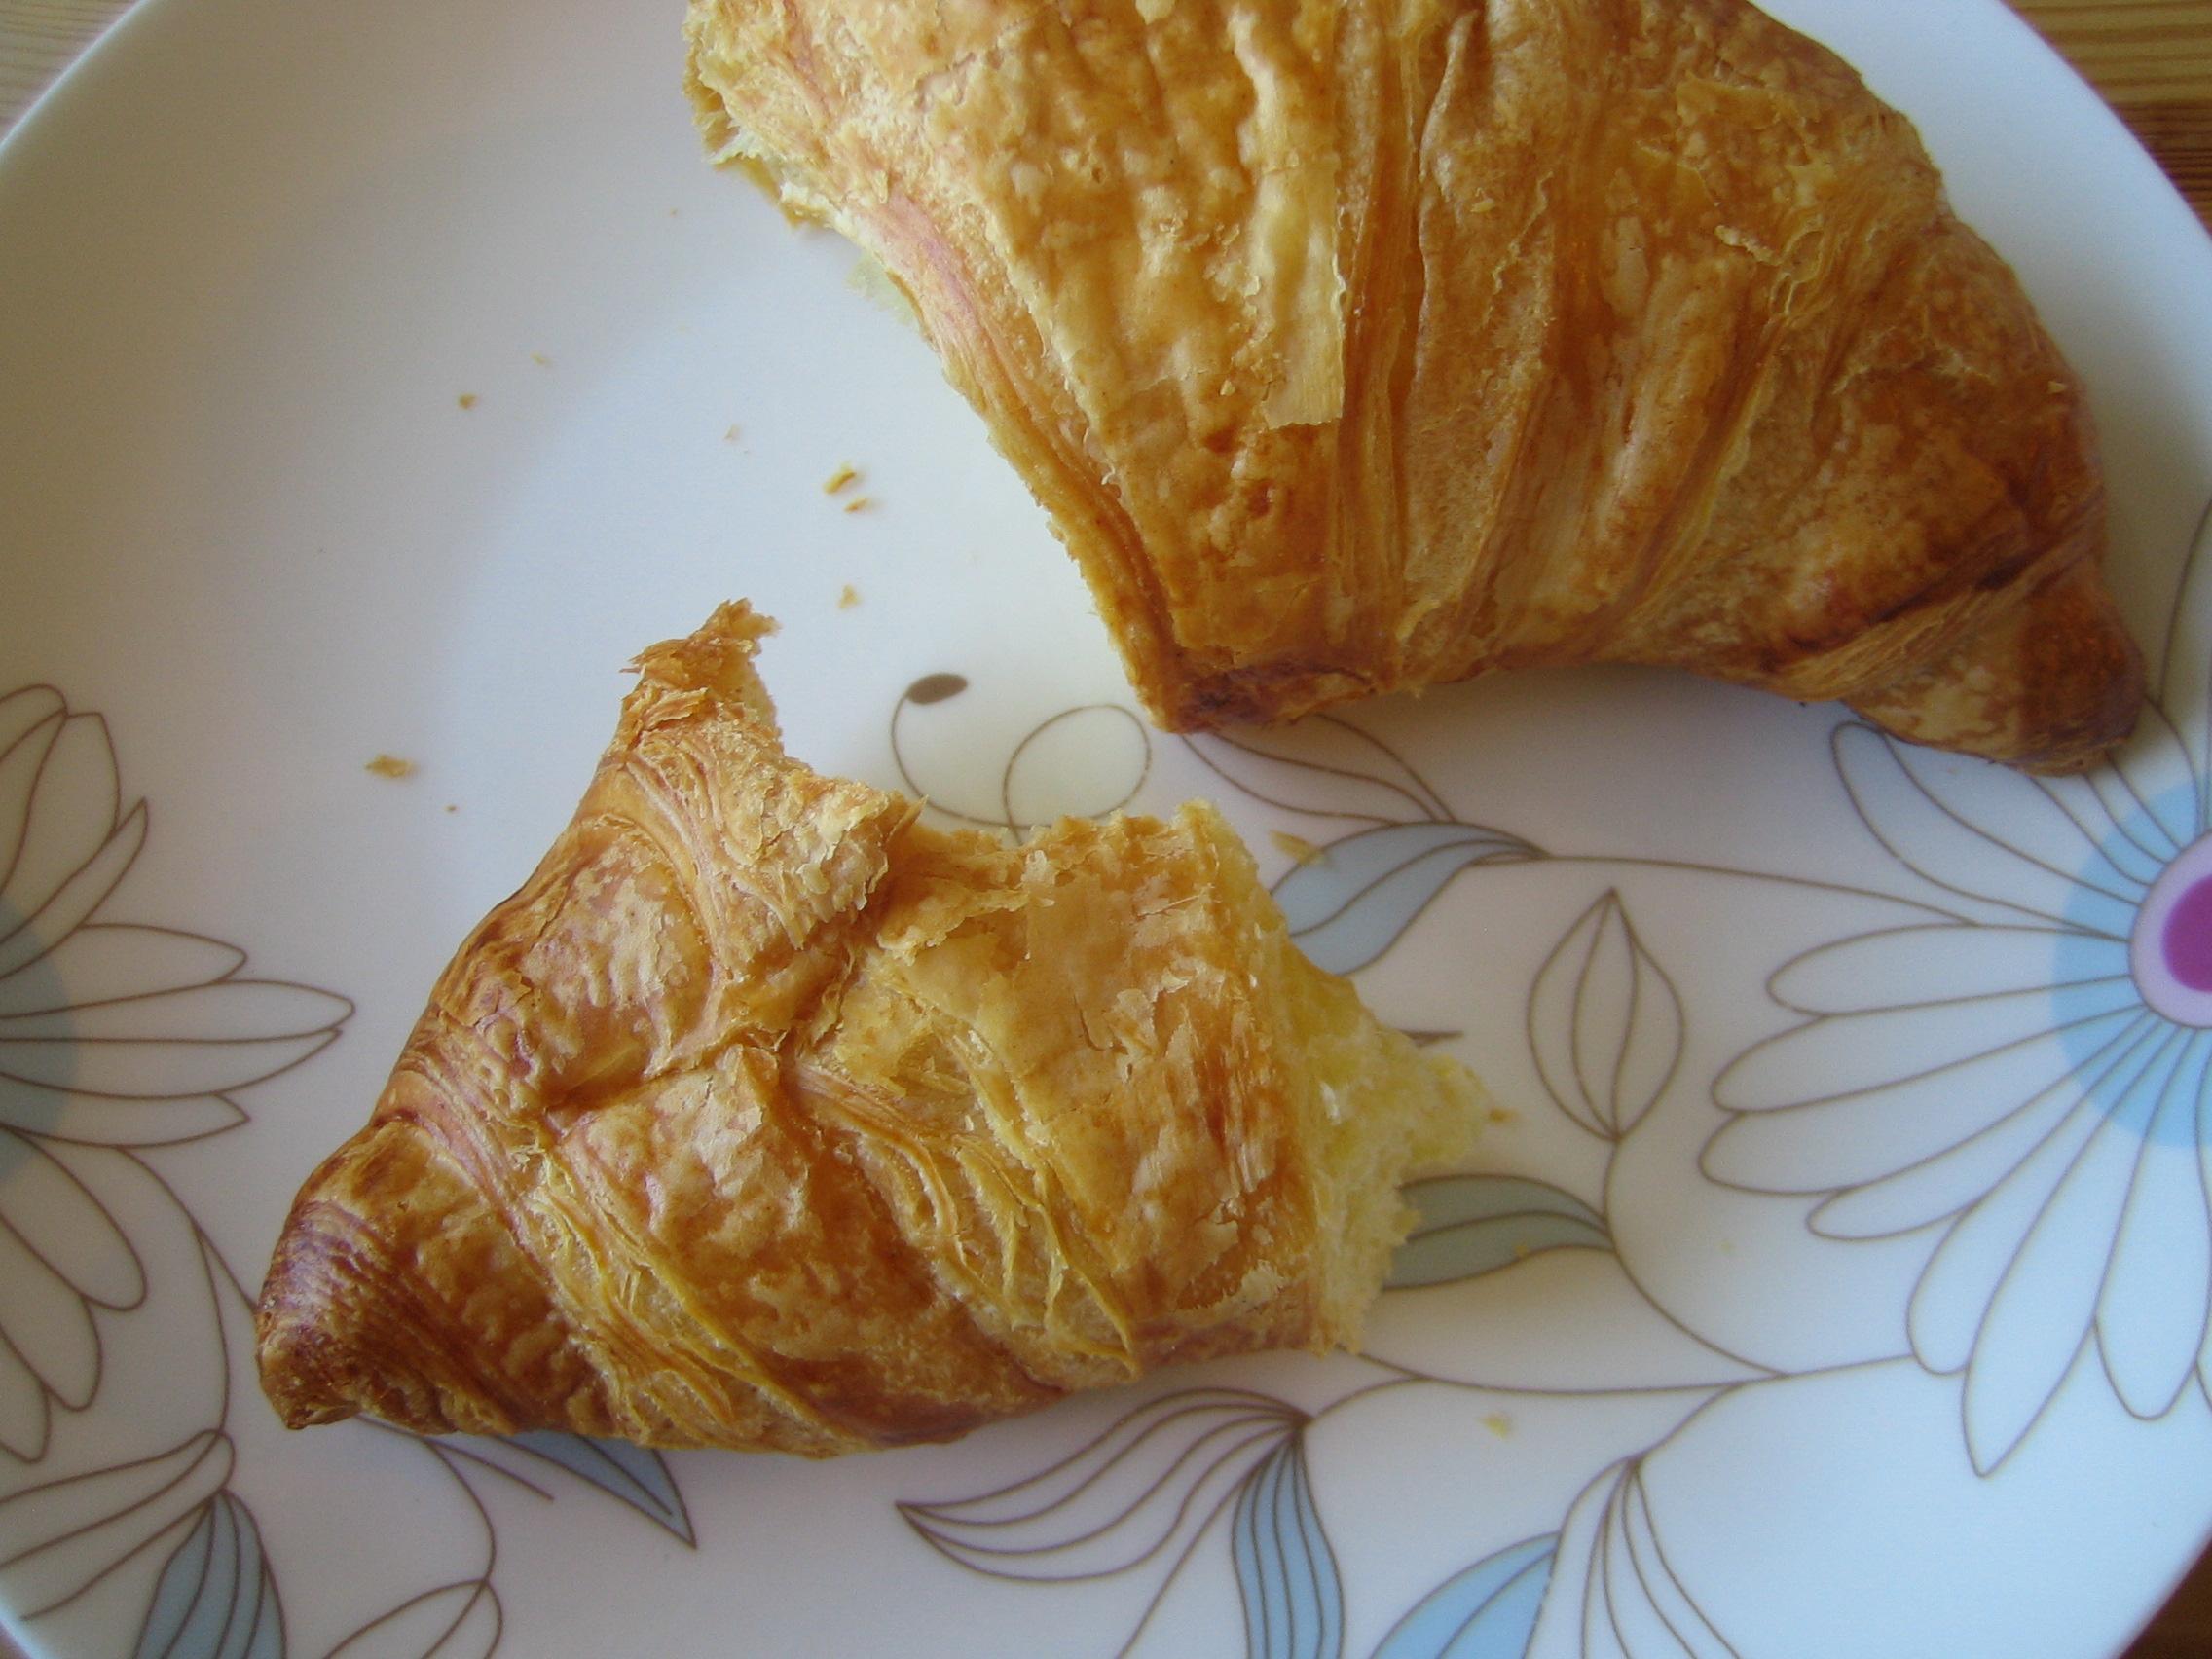 Tim Hortons Croissant 1